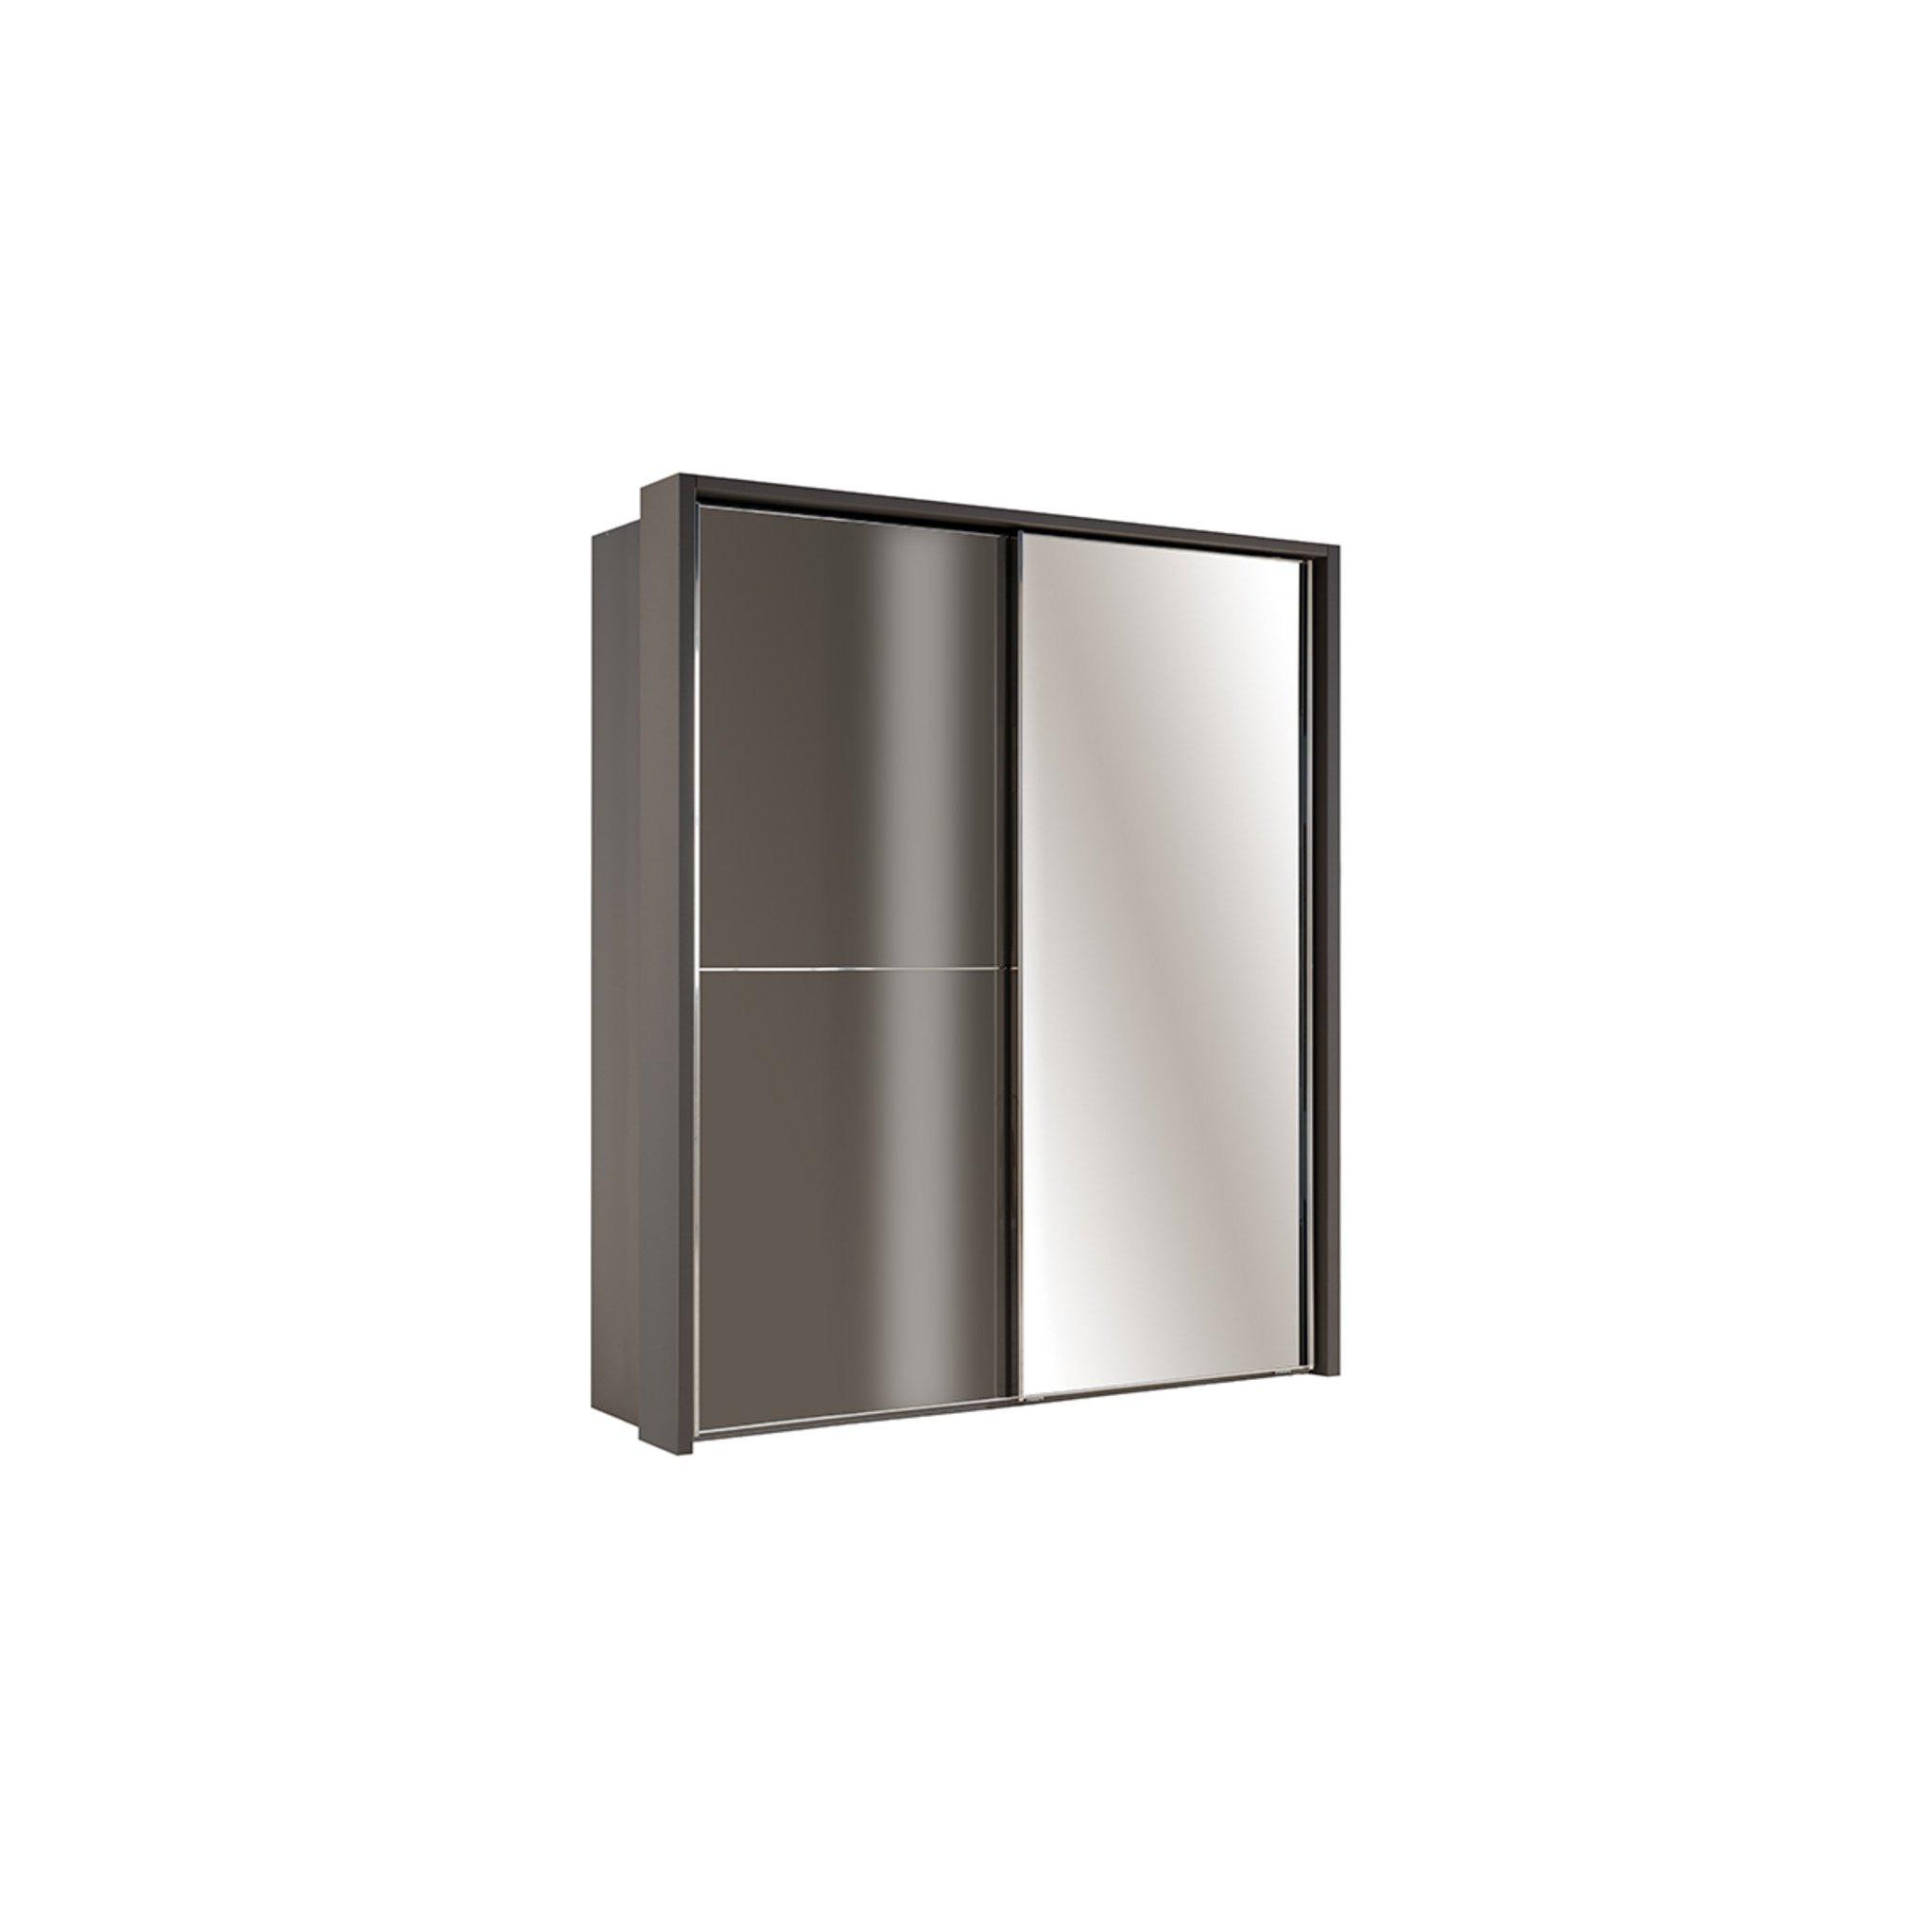 image-Sicily 2 Door Sliding Wardrobe + External LEDs